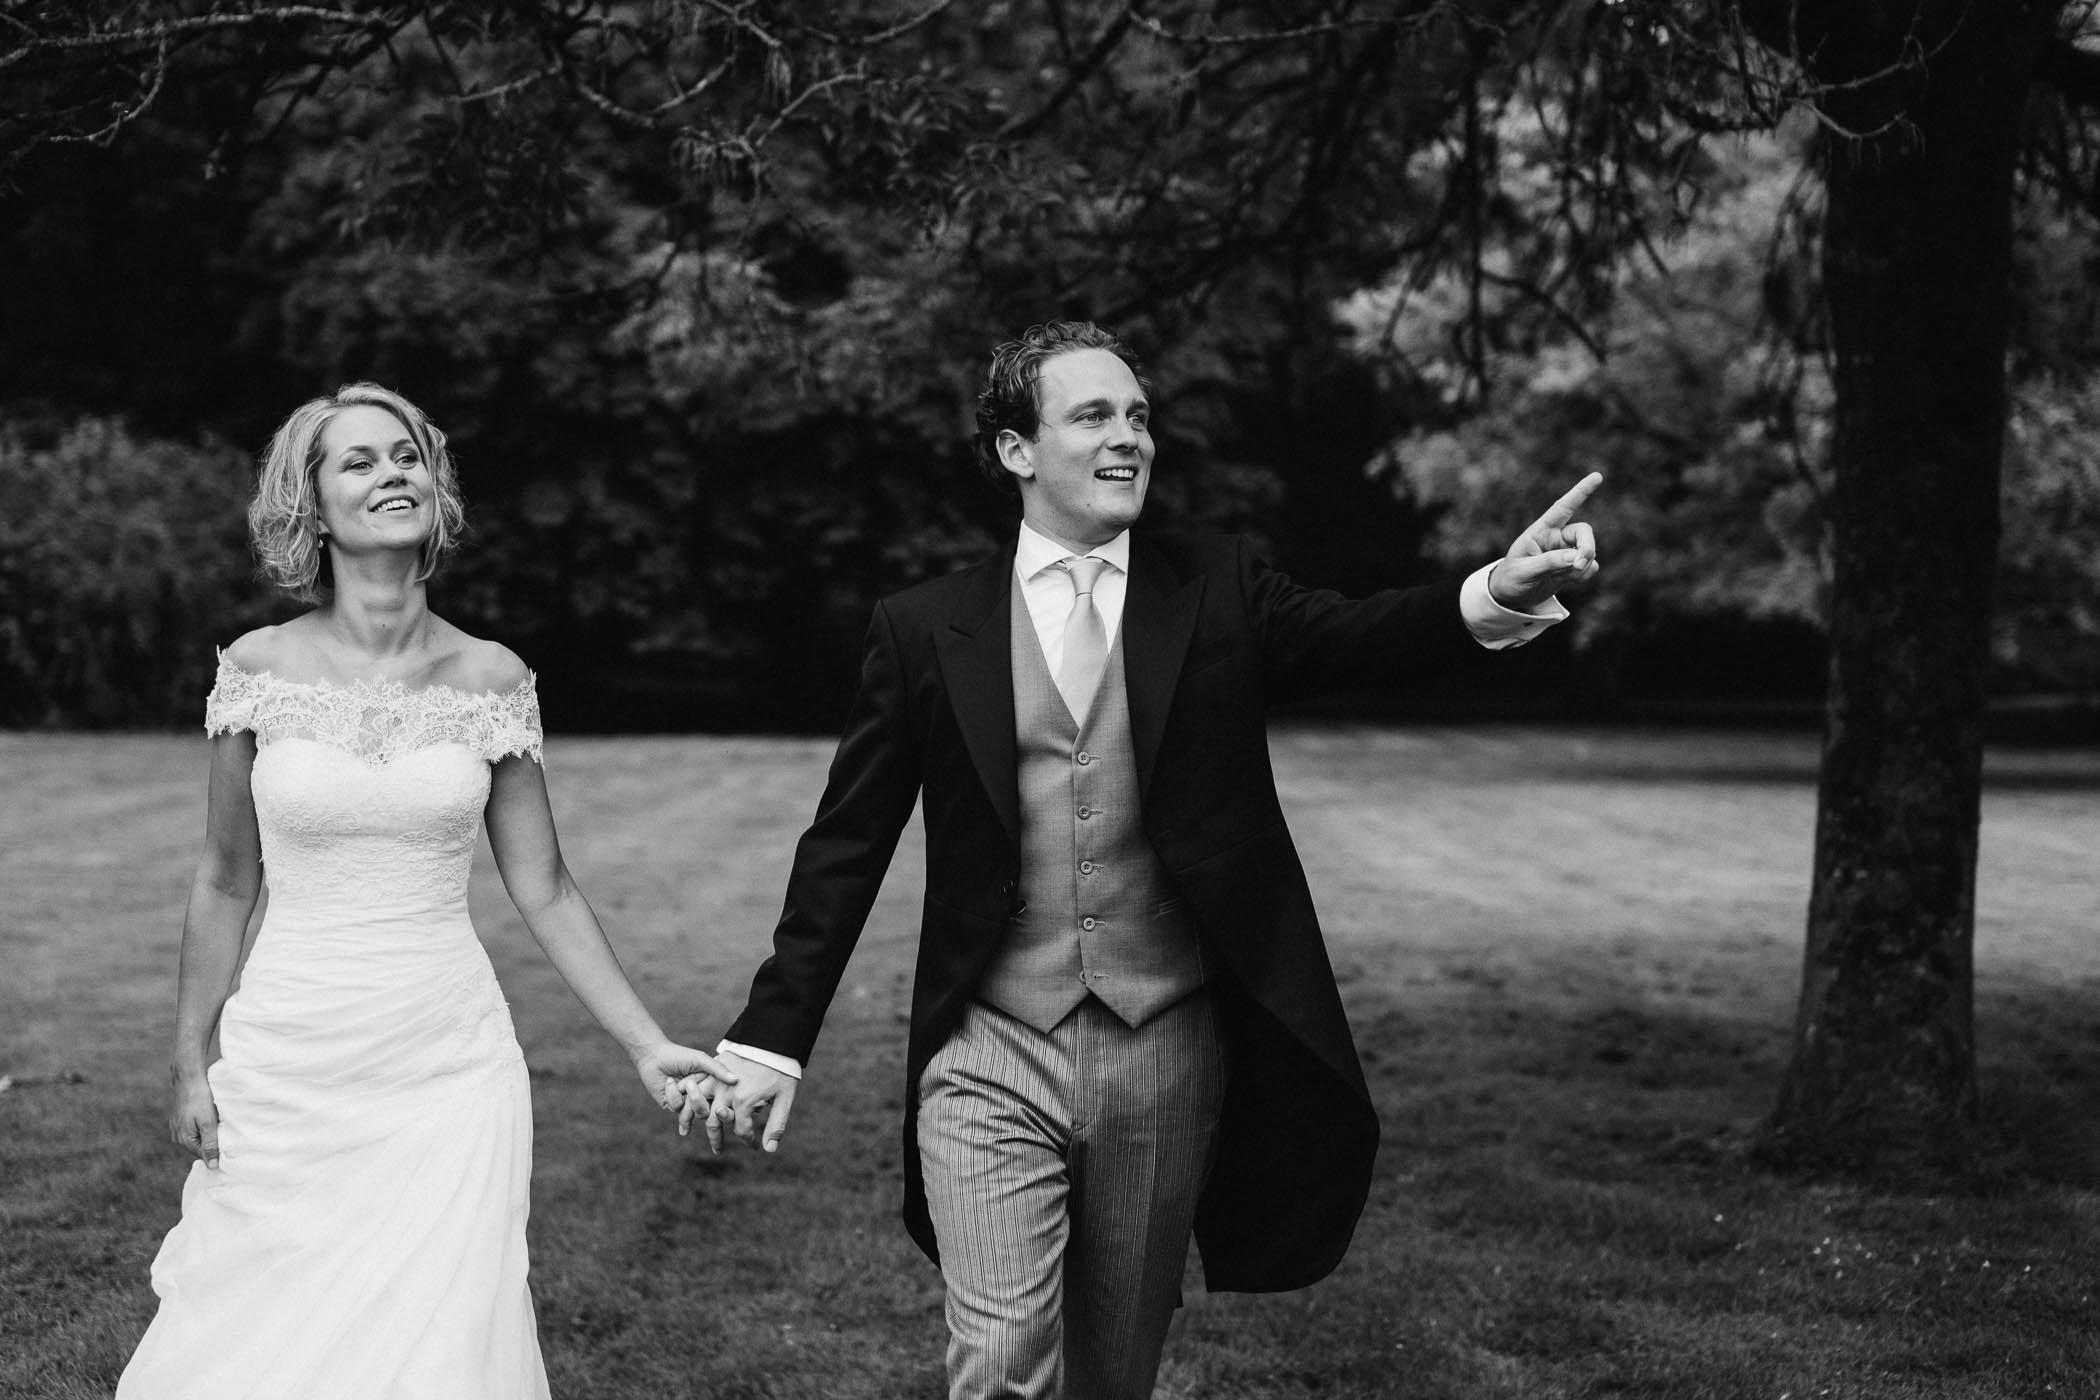 originele bruidsfoto's fotograaf journalistiek fotoshoot